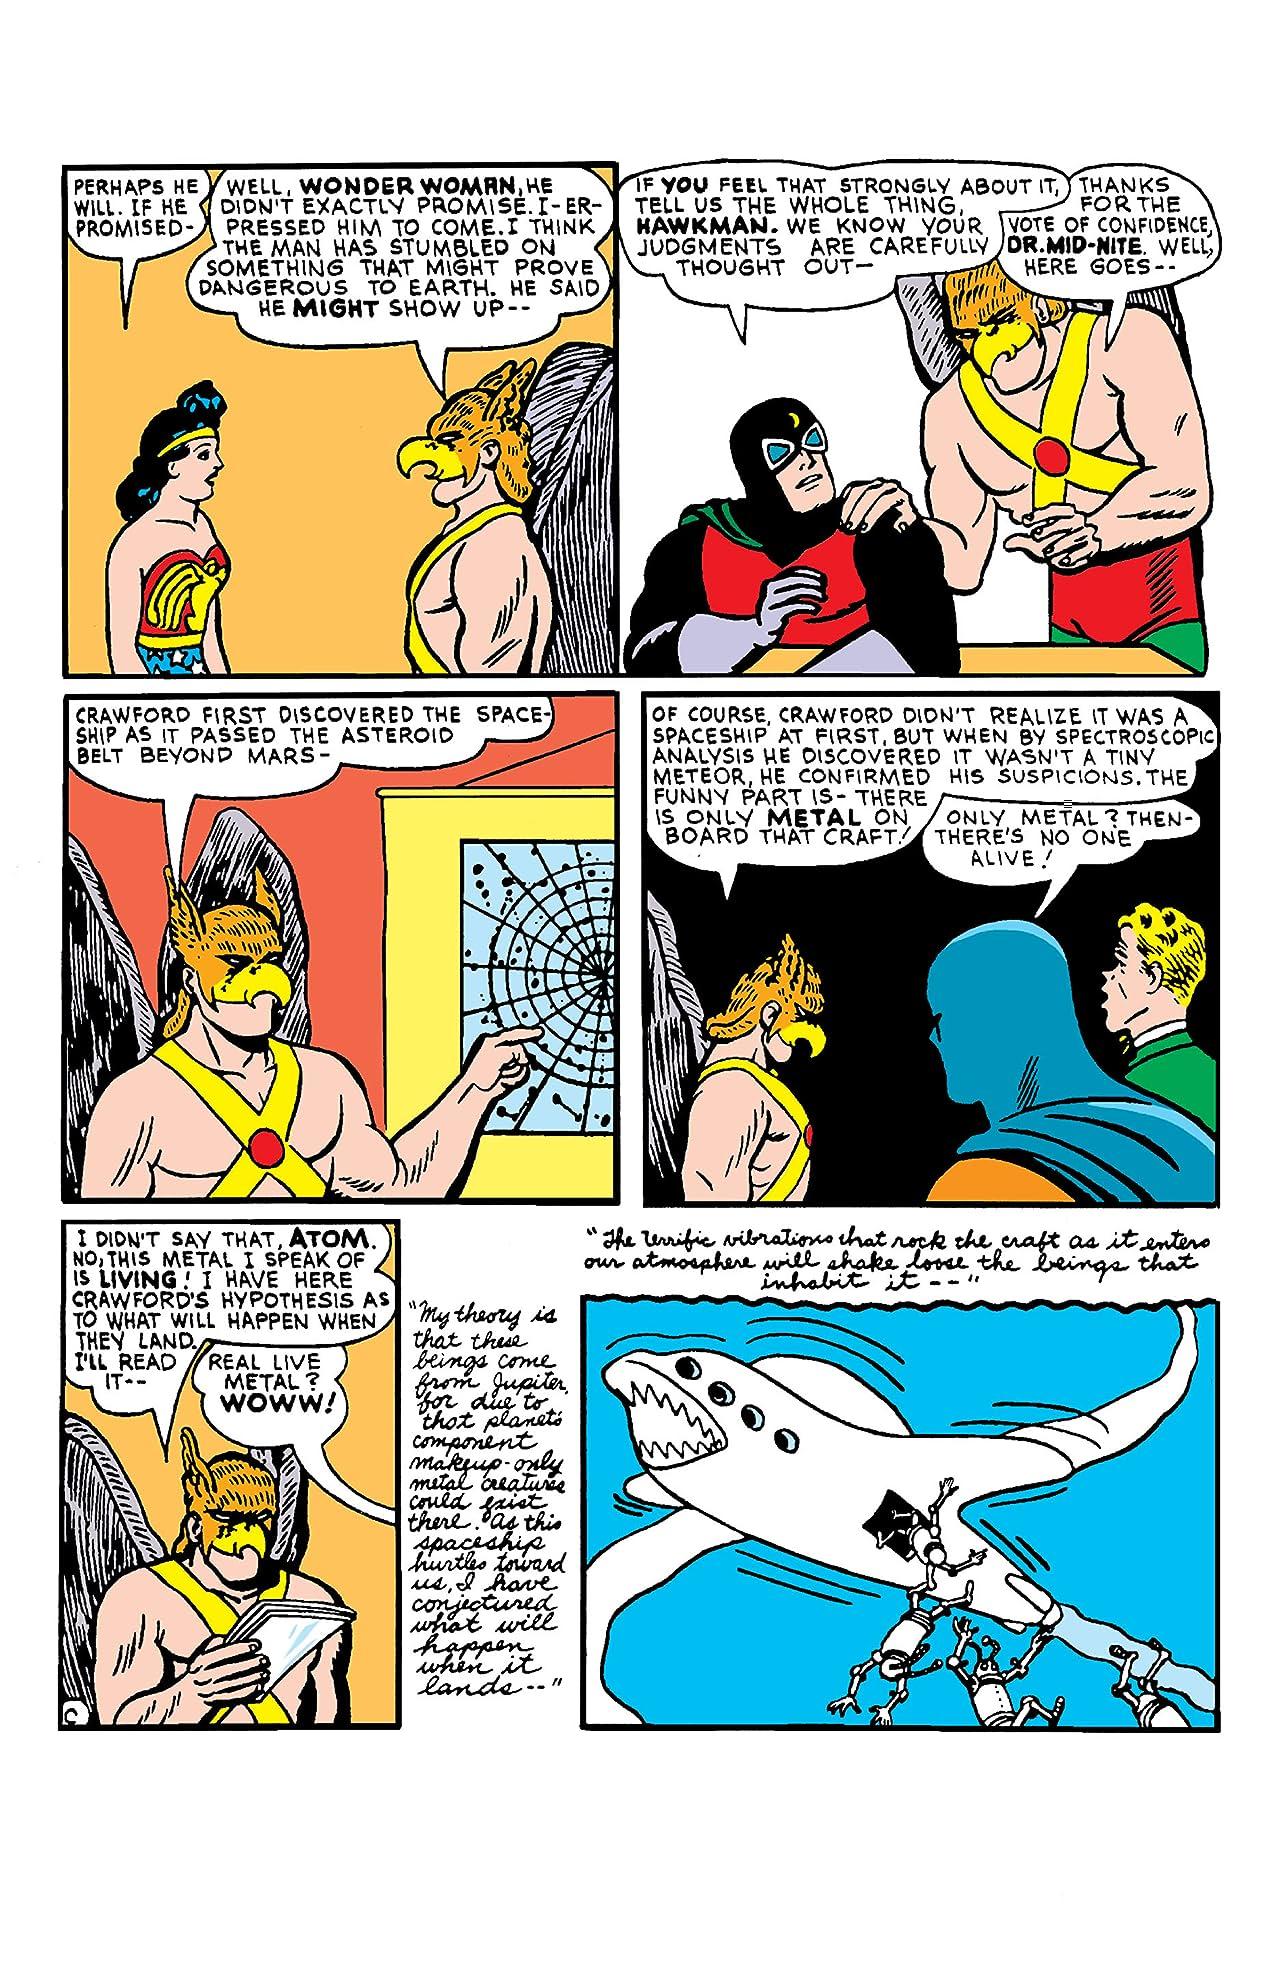 All-Star Comics #26